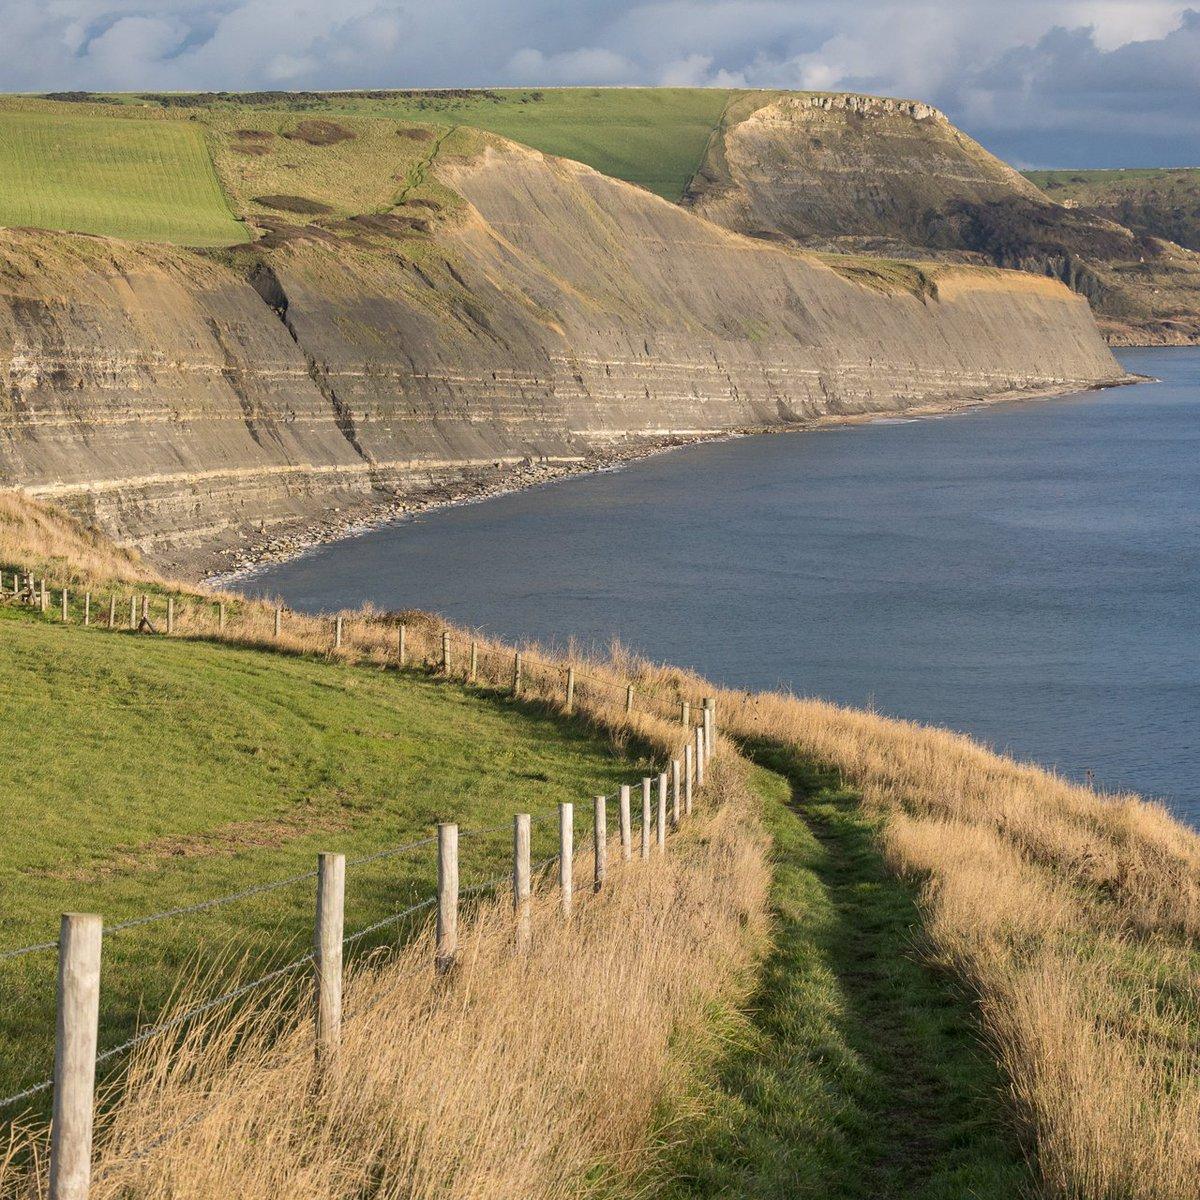 Read about @QuintinLake's coast project in #WalkMagazine, then grab a camera & go #walking https://t.co/JuADEXr29b https://t.co/tnVIt5IXXU